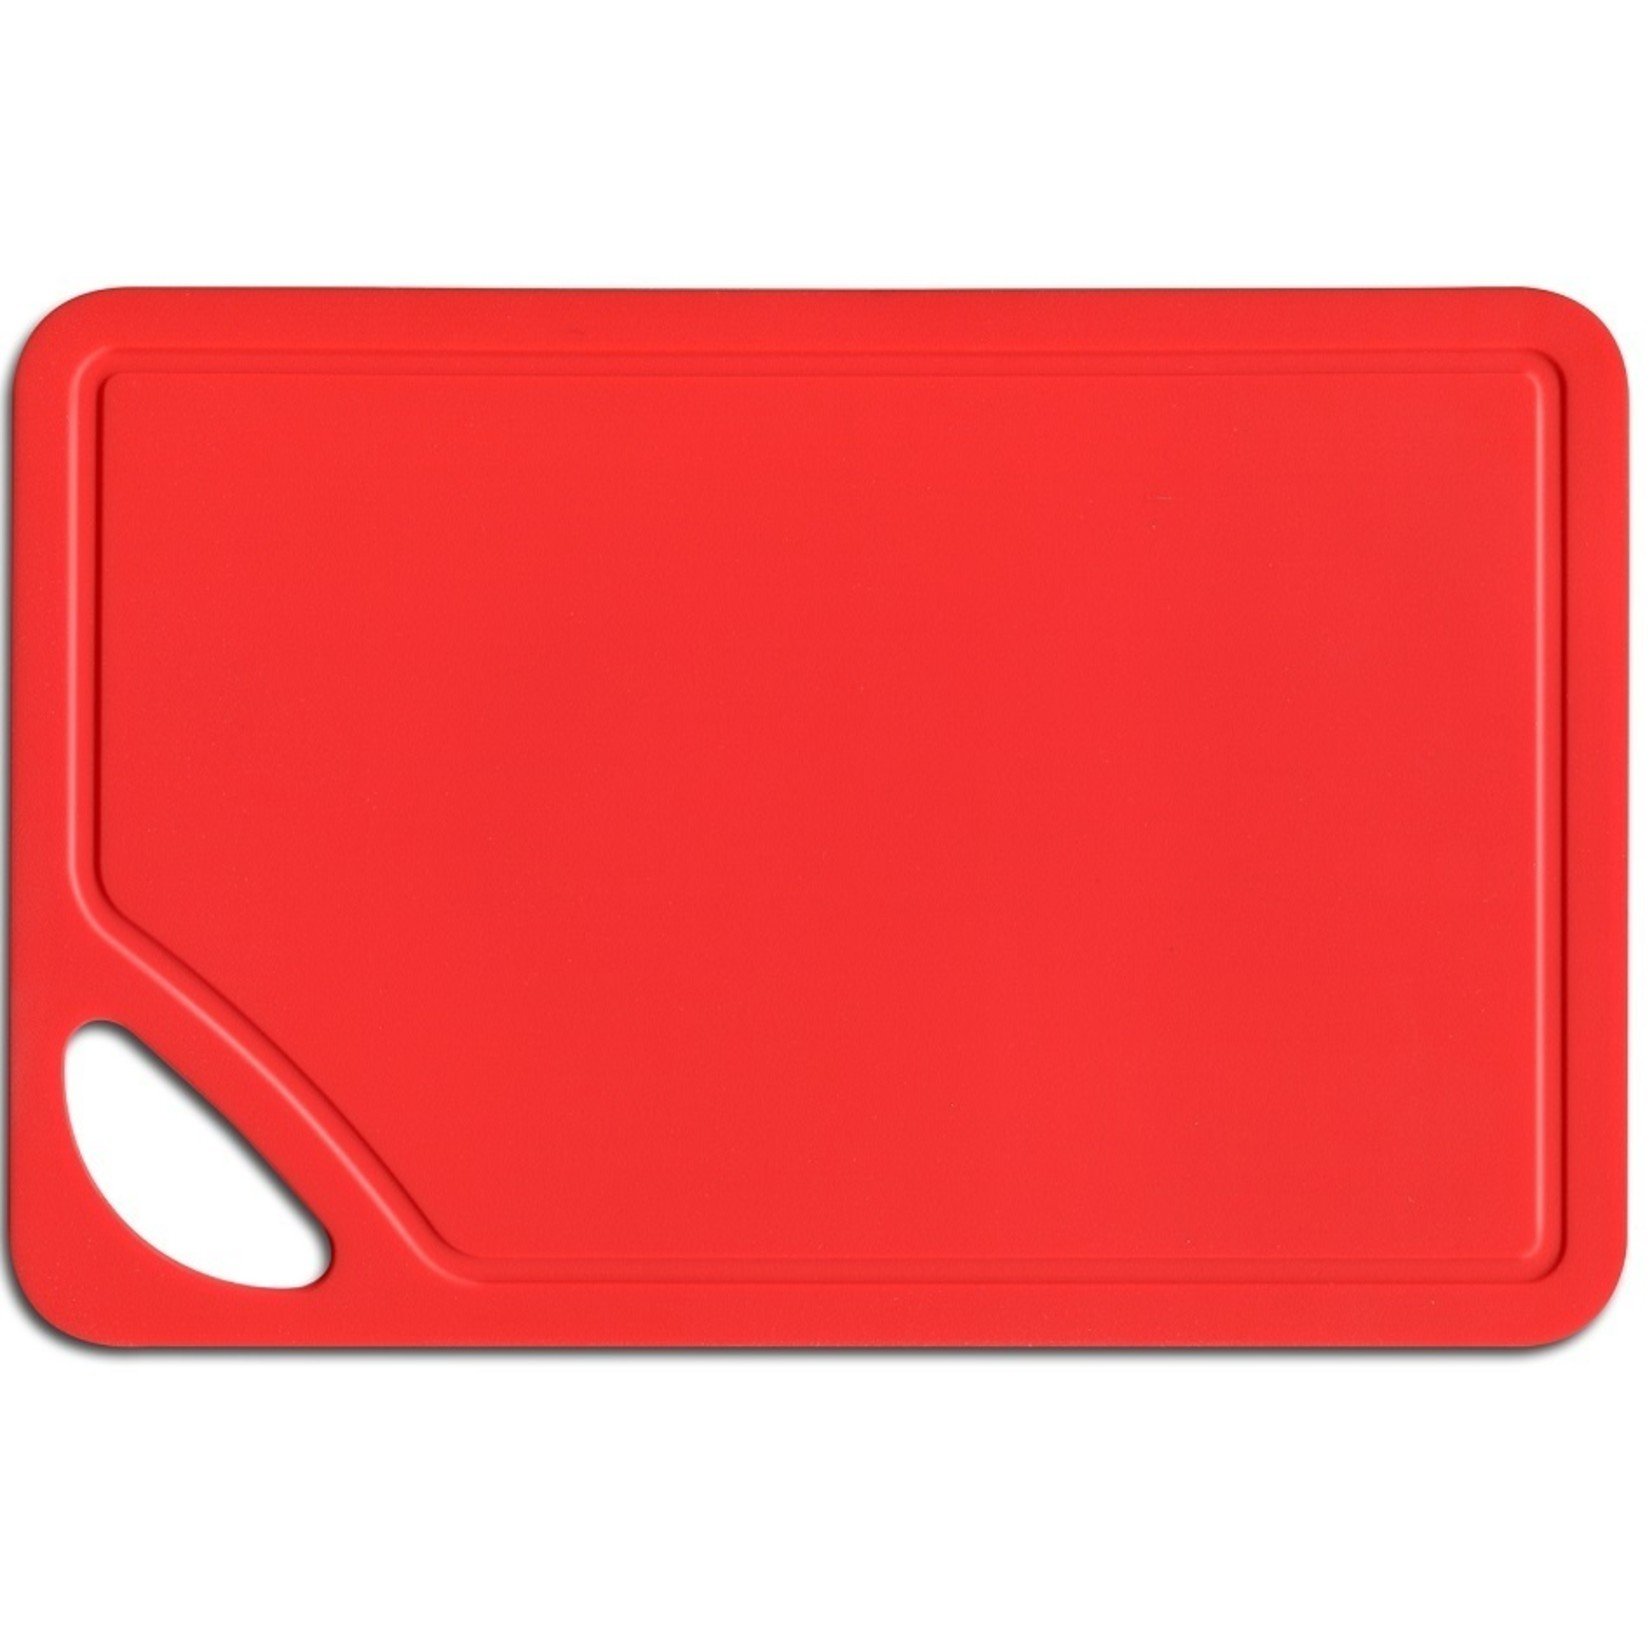 Wusthof Wusthof snijplank rood 26x17cm